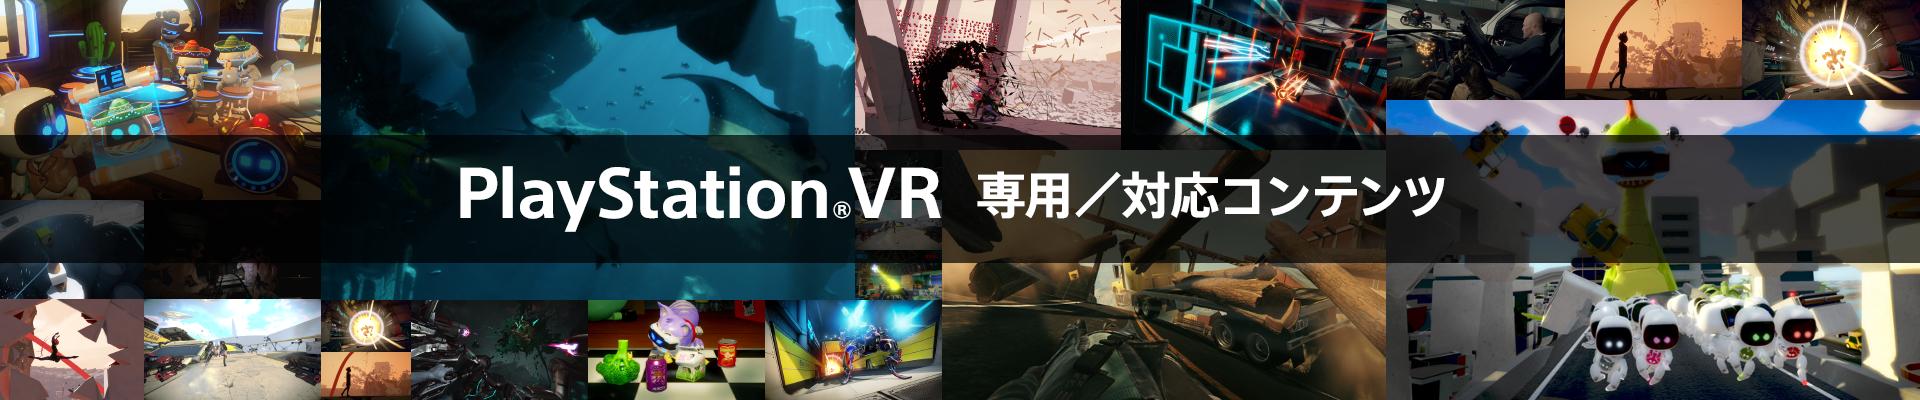 PlayStation VR 専用/対応コンテンツ